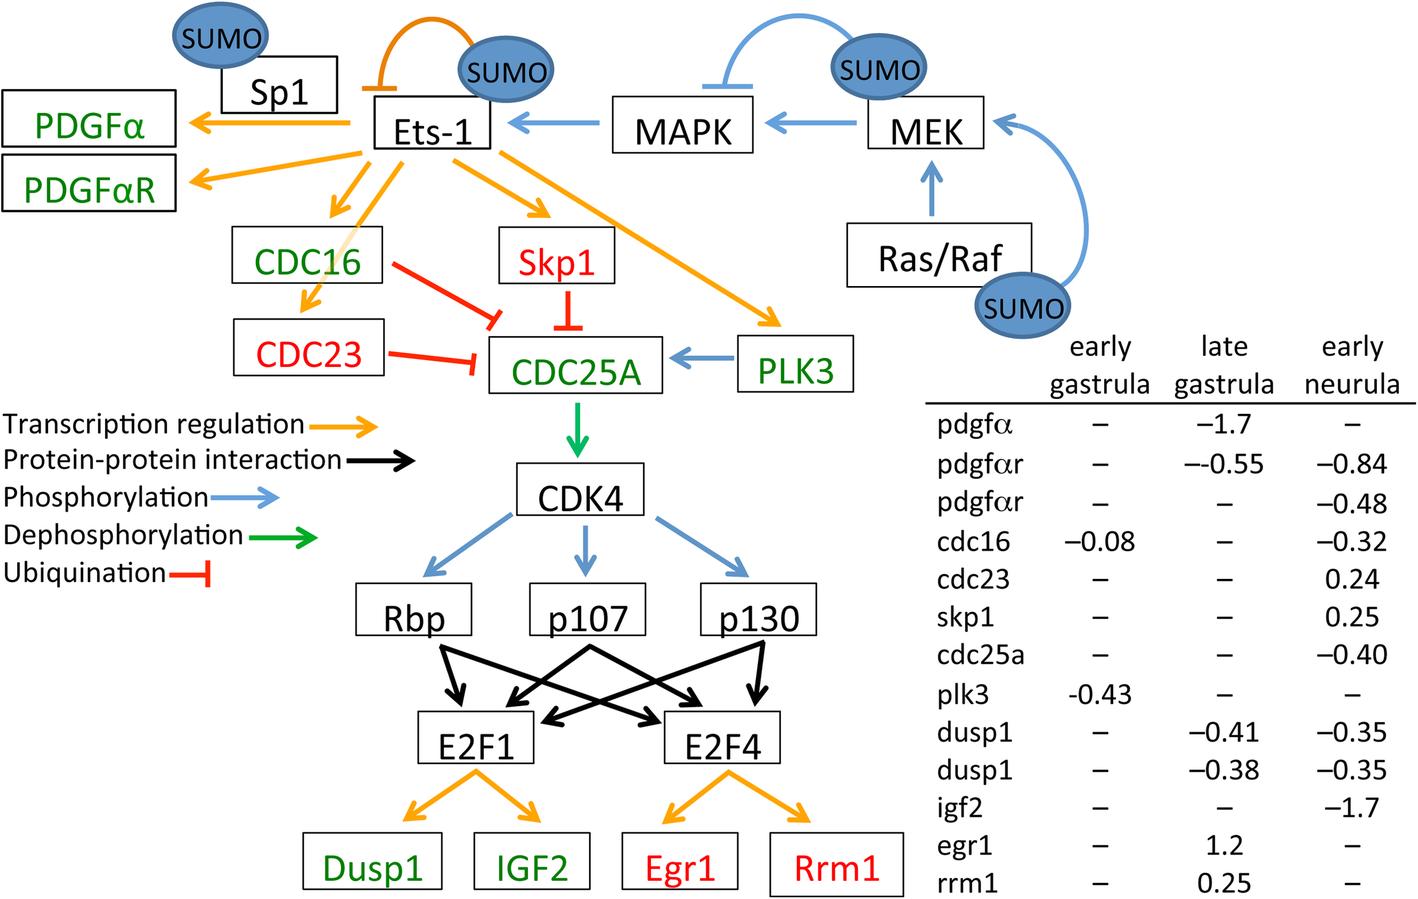 A deficiency in SUMOylation activity disrupts multiple